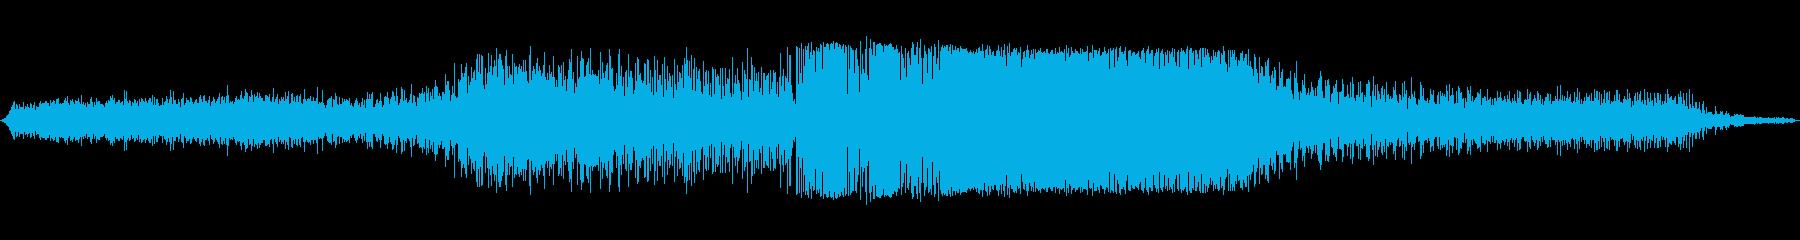 M-38アーミージープ:プルアップ...の再生済みの波形